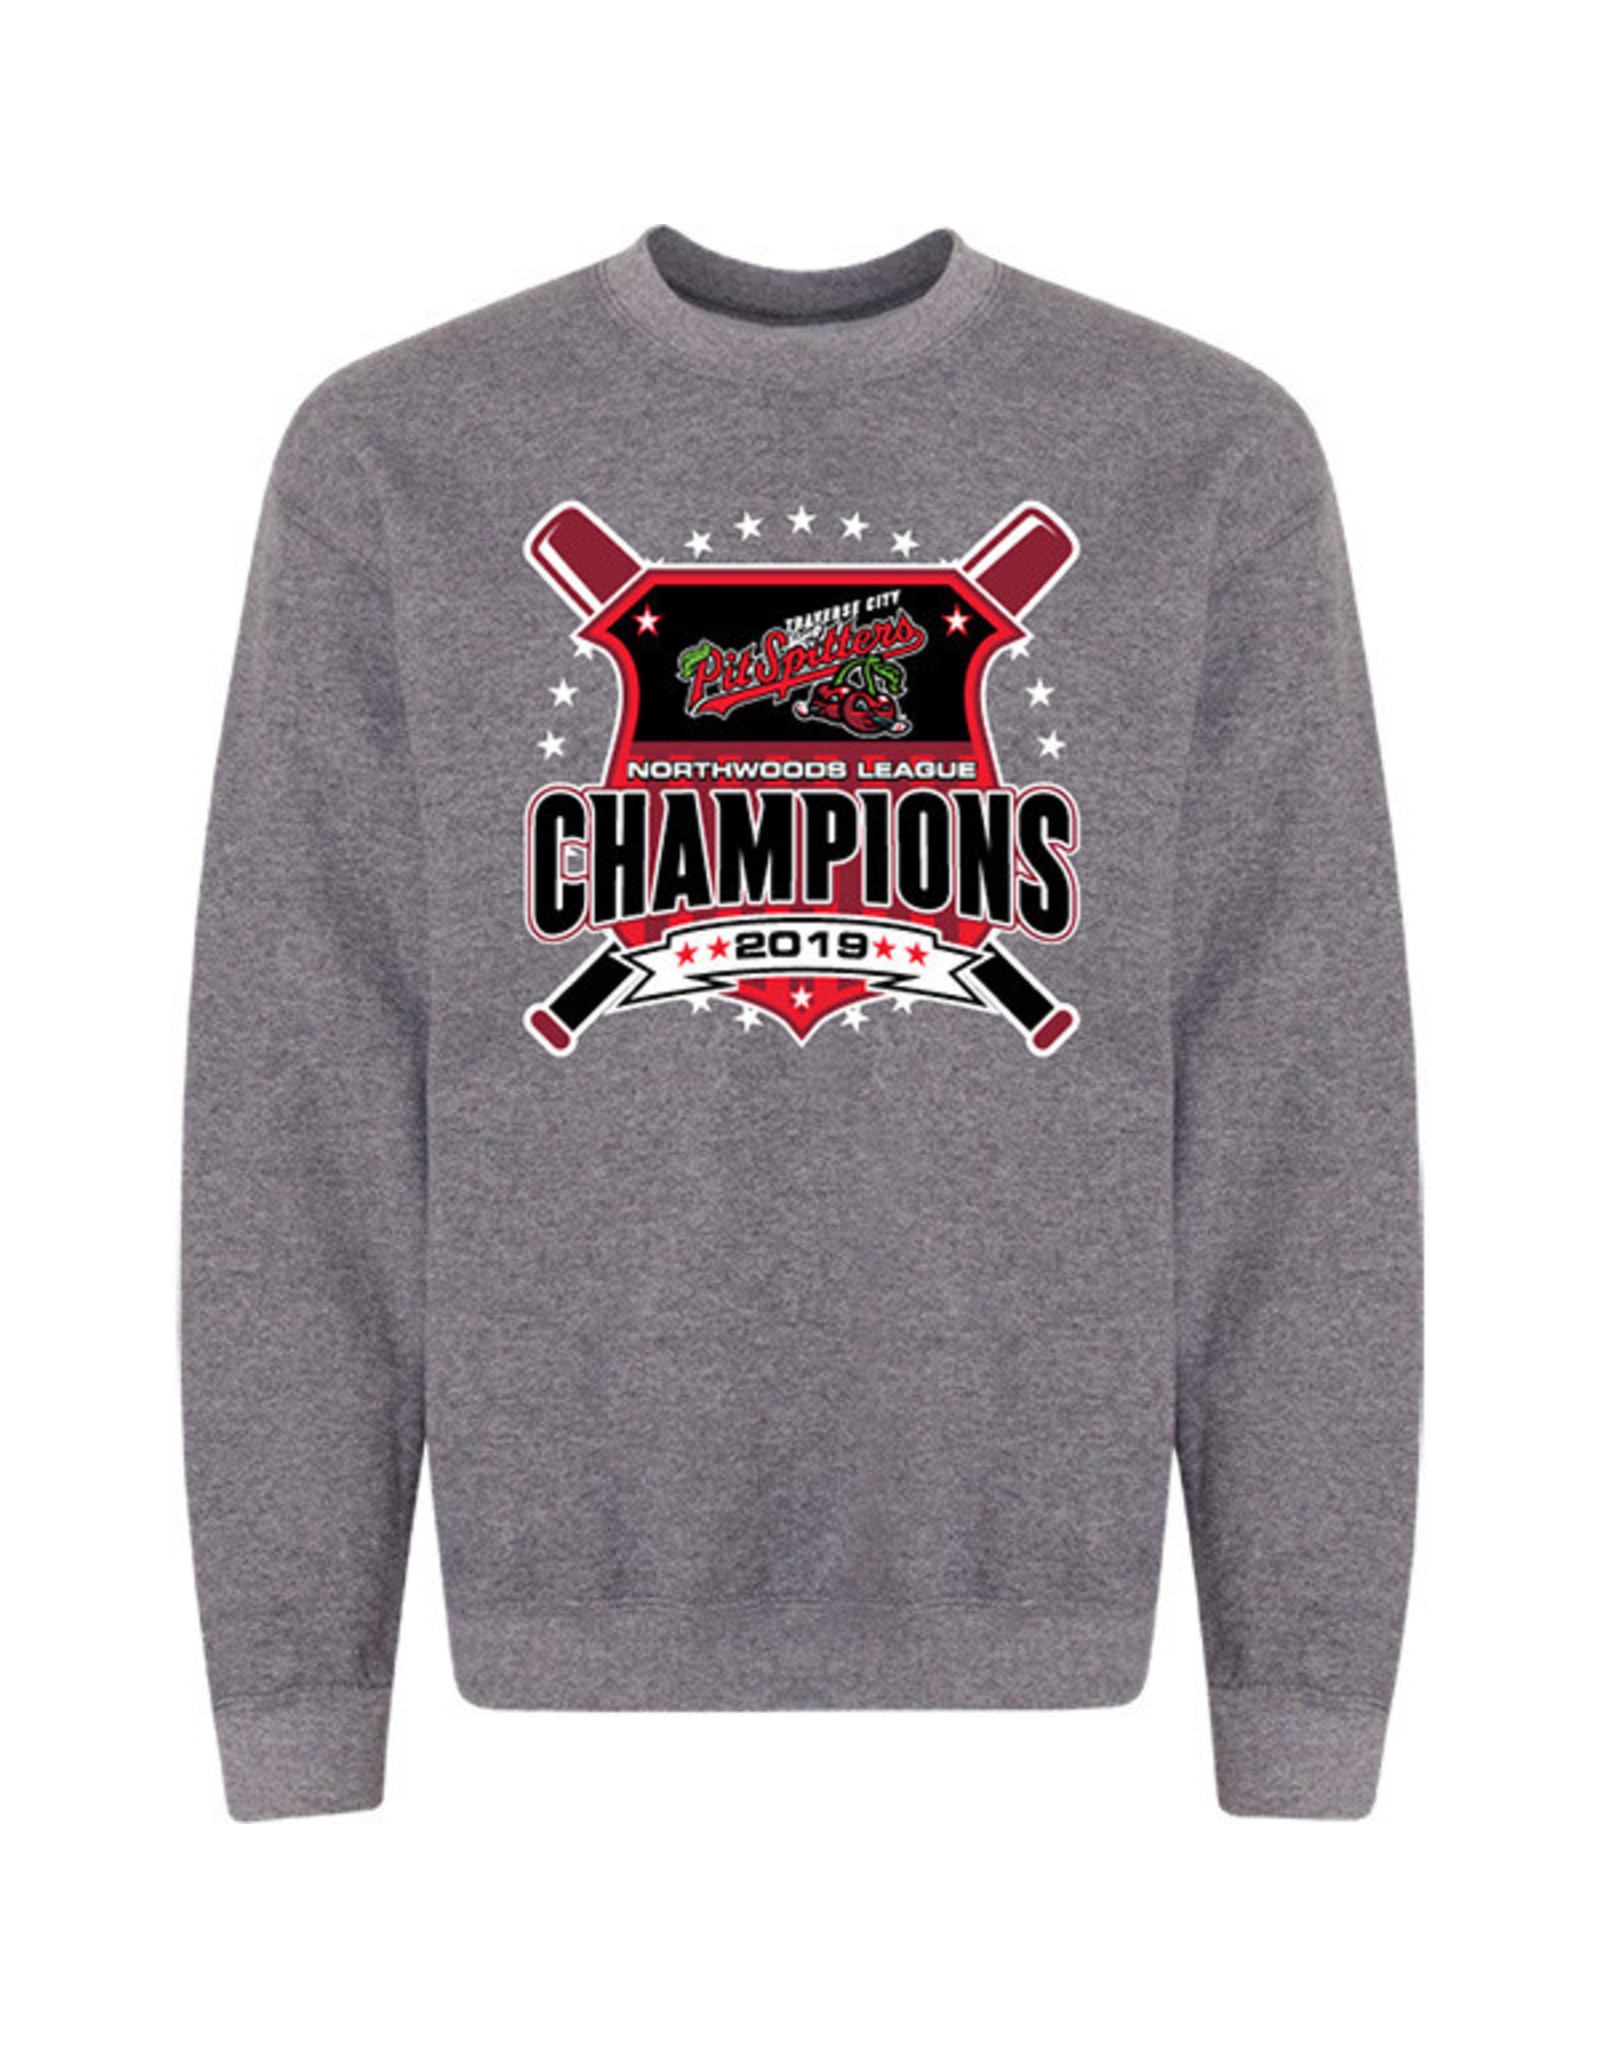 3024 2019 Champions Graphite Crew